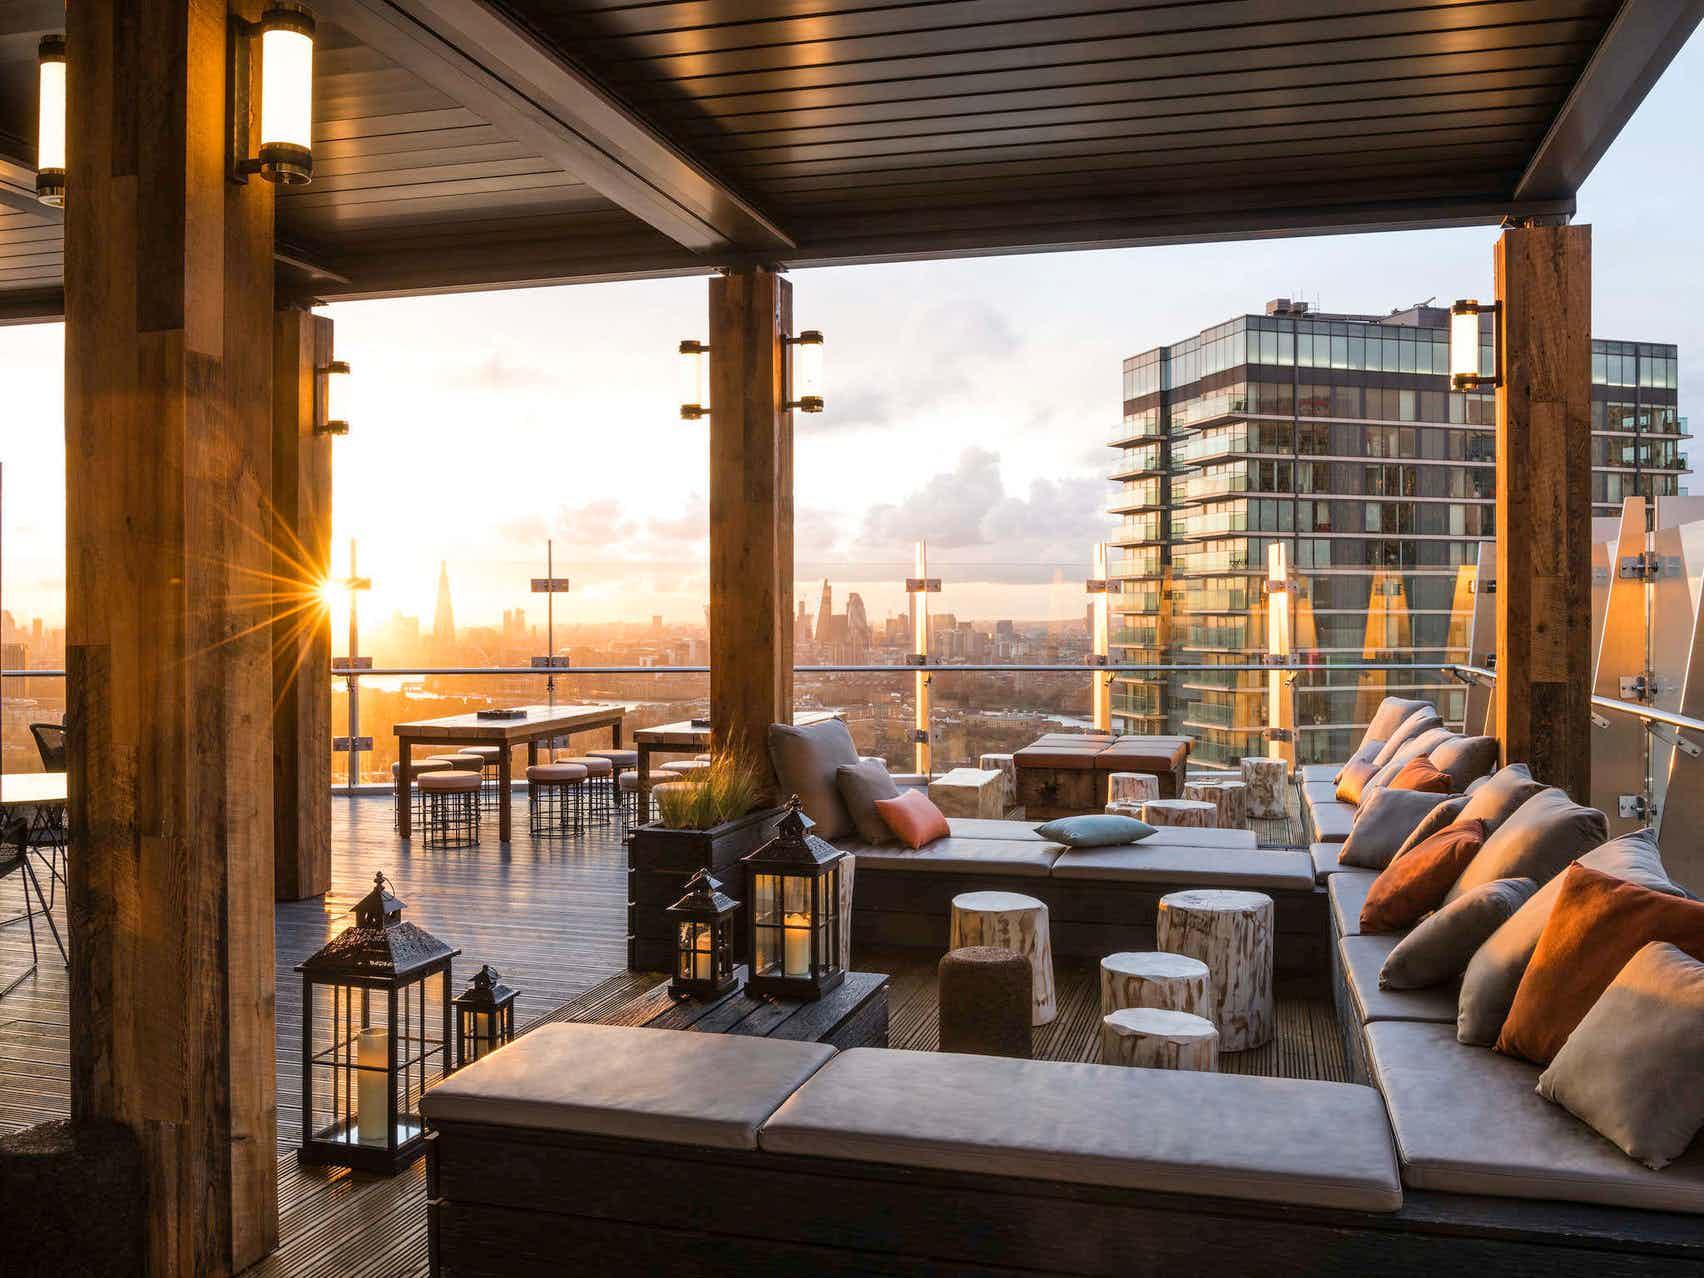 Bokan 39, Novotel London Canary Wharf